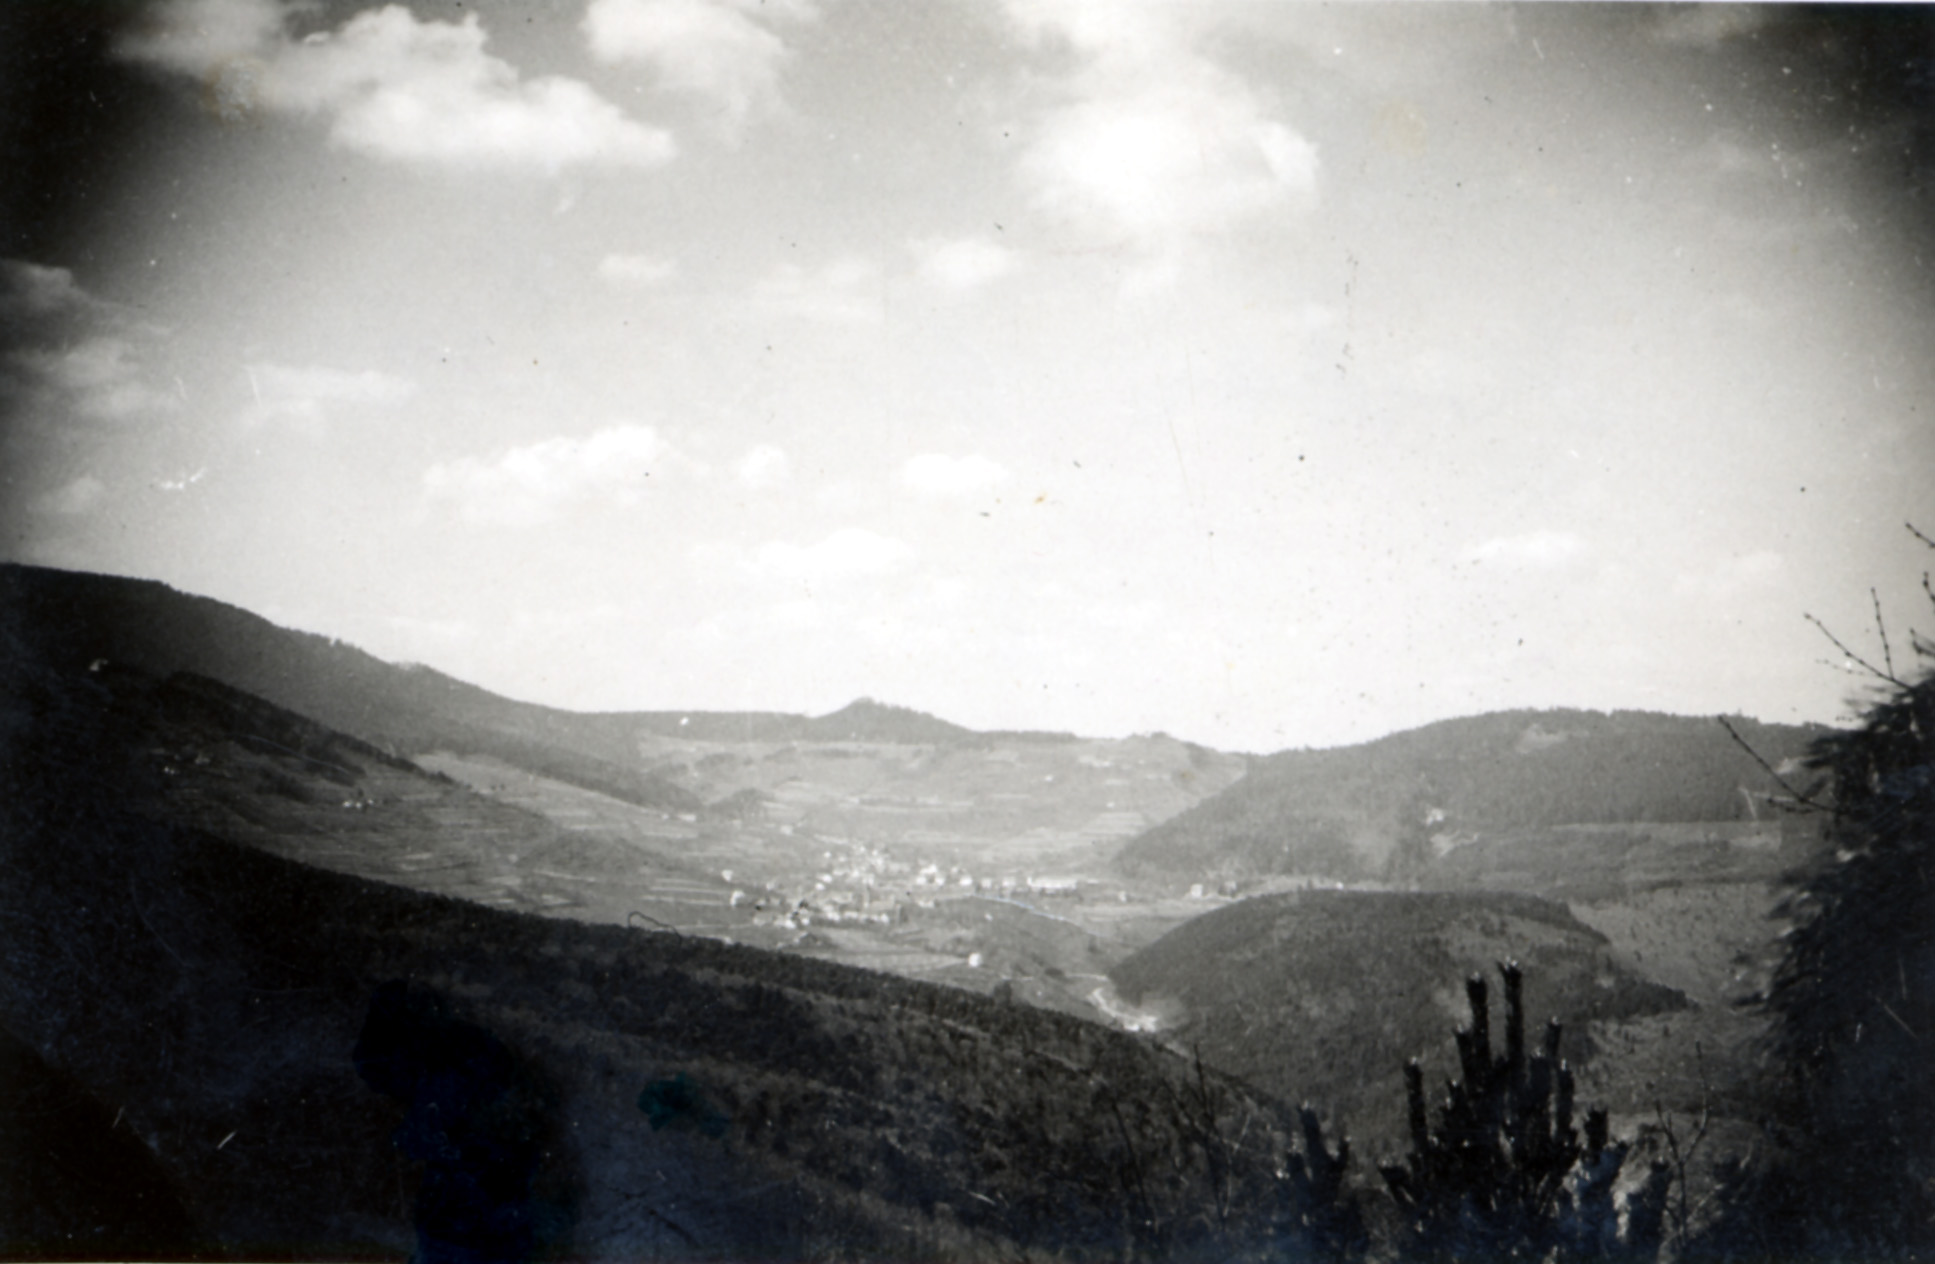 1935-1940 thannenkirch-ribeauville